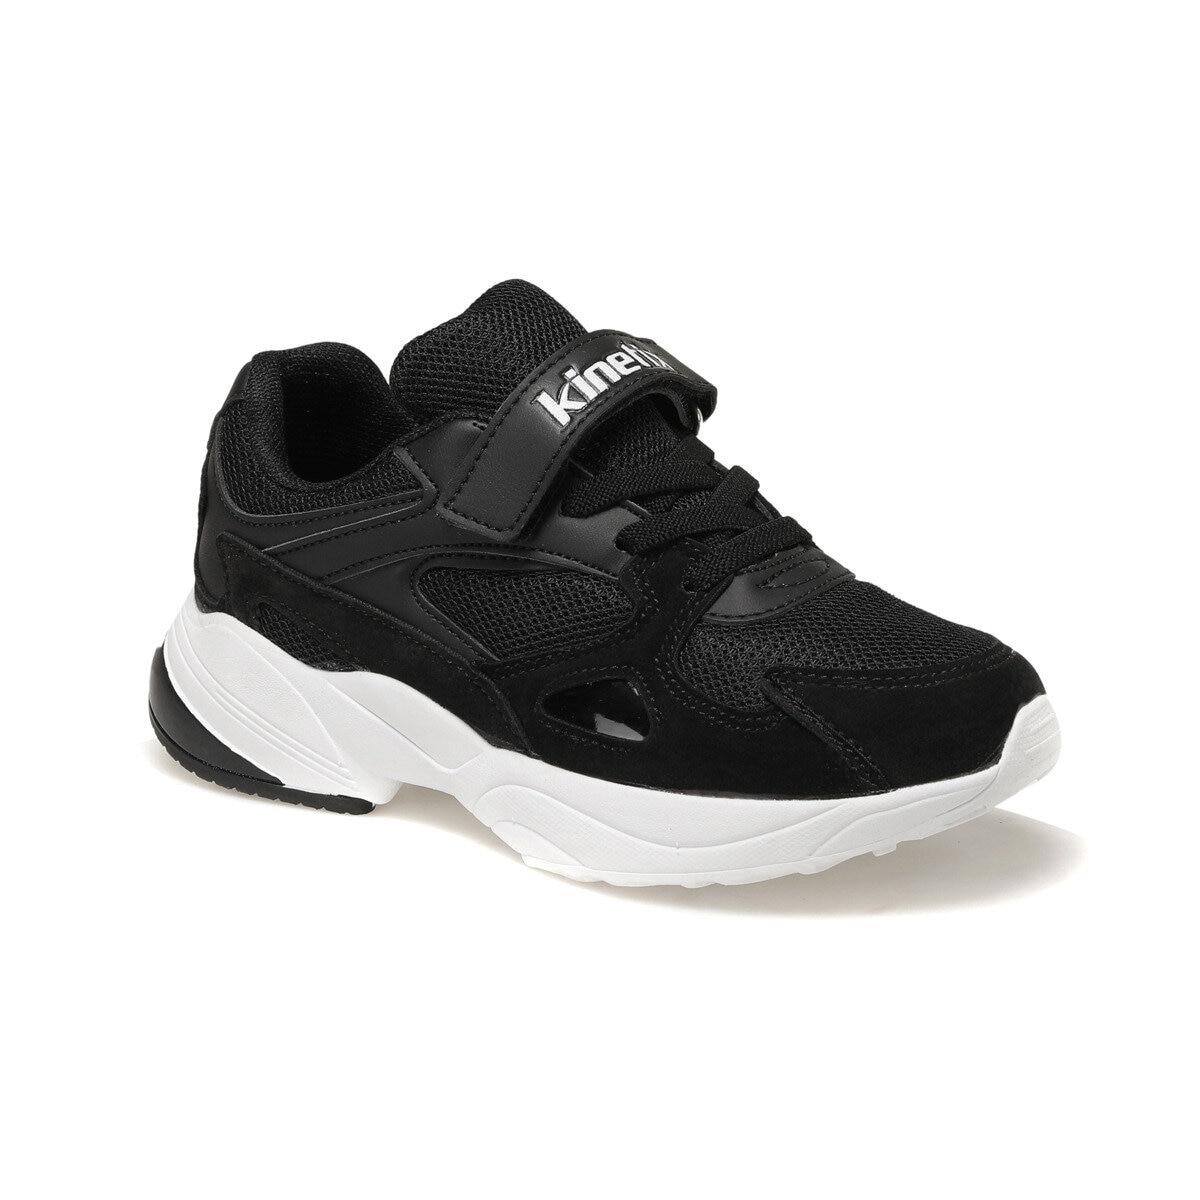 FLO PERRIGRIN 9PR Black Male Child Hiking Shoes KINETIX